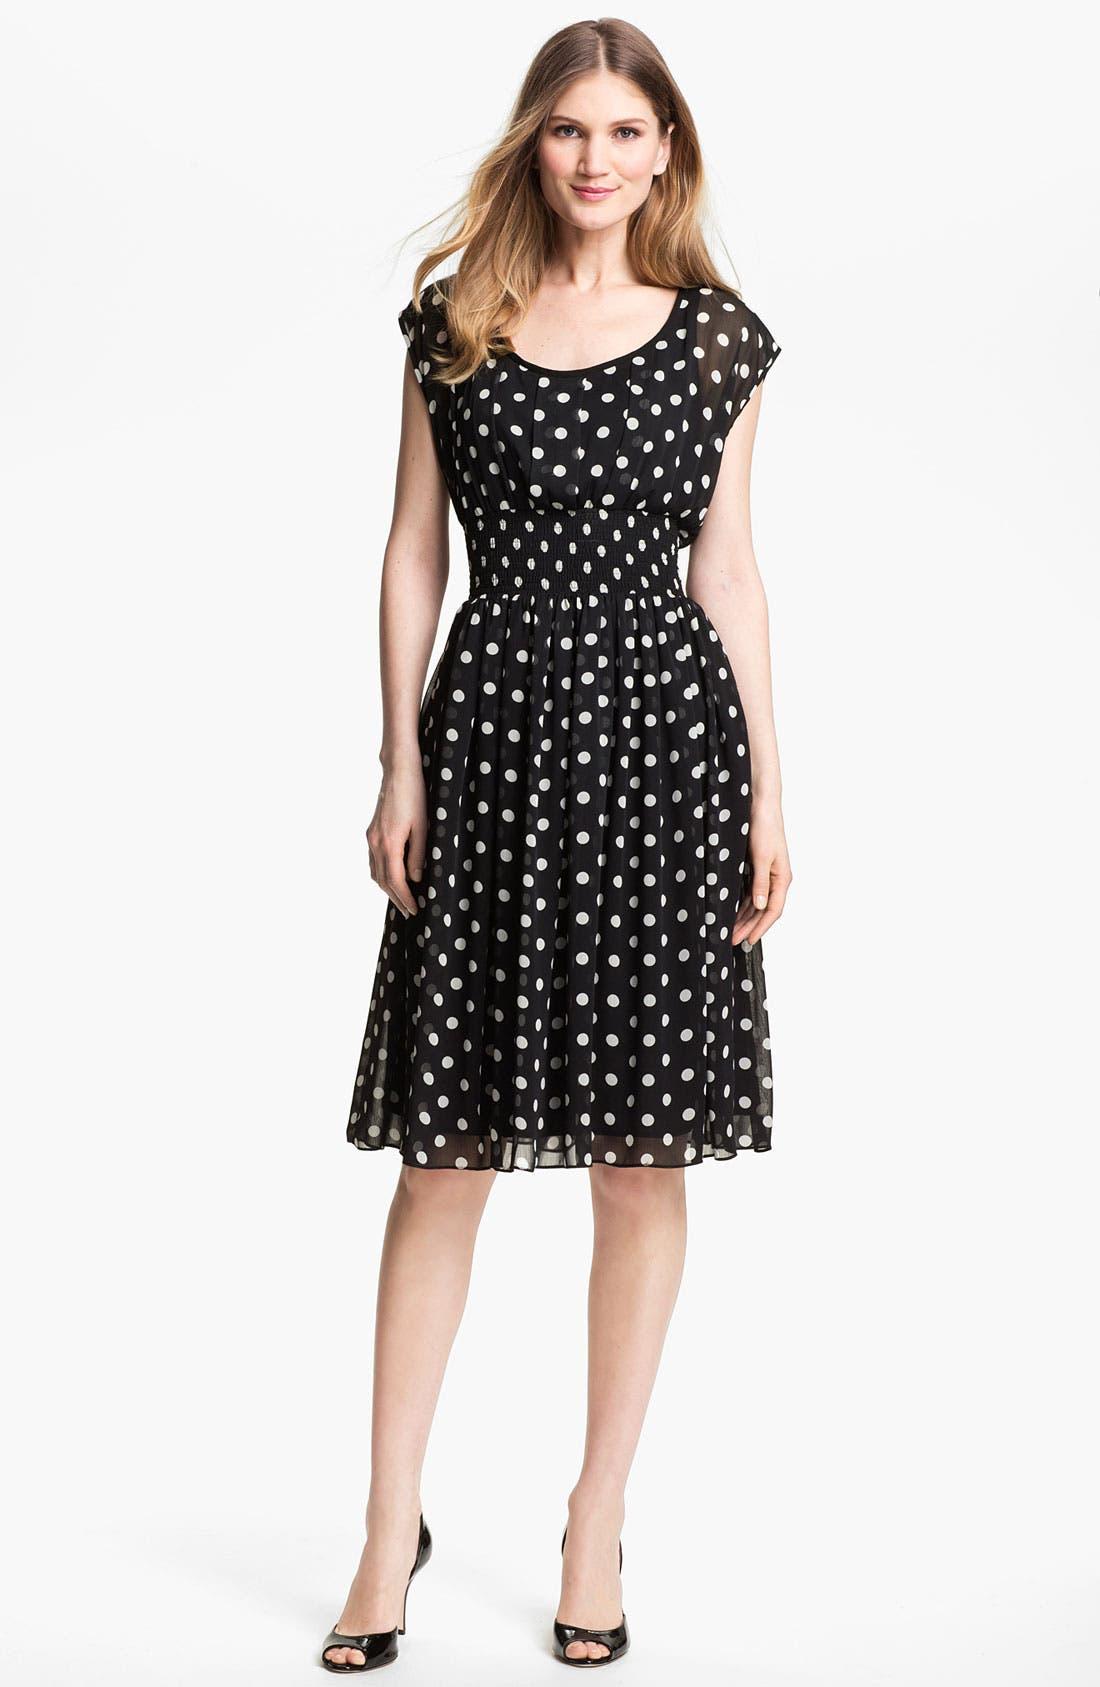 Alternate Image 1 Selected - Isaac Mizrahi New York Polka Dot Chiffon Dress